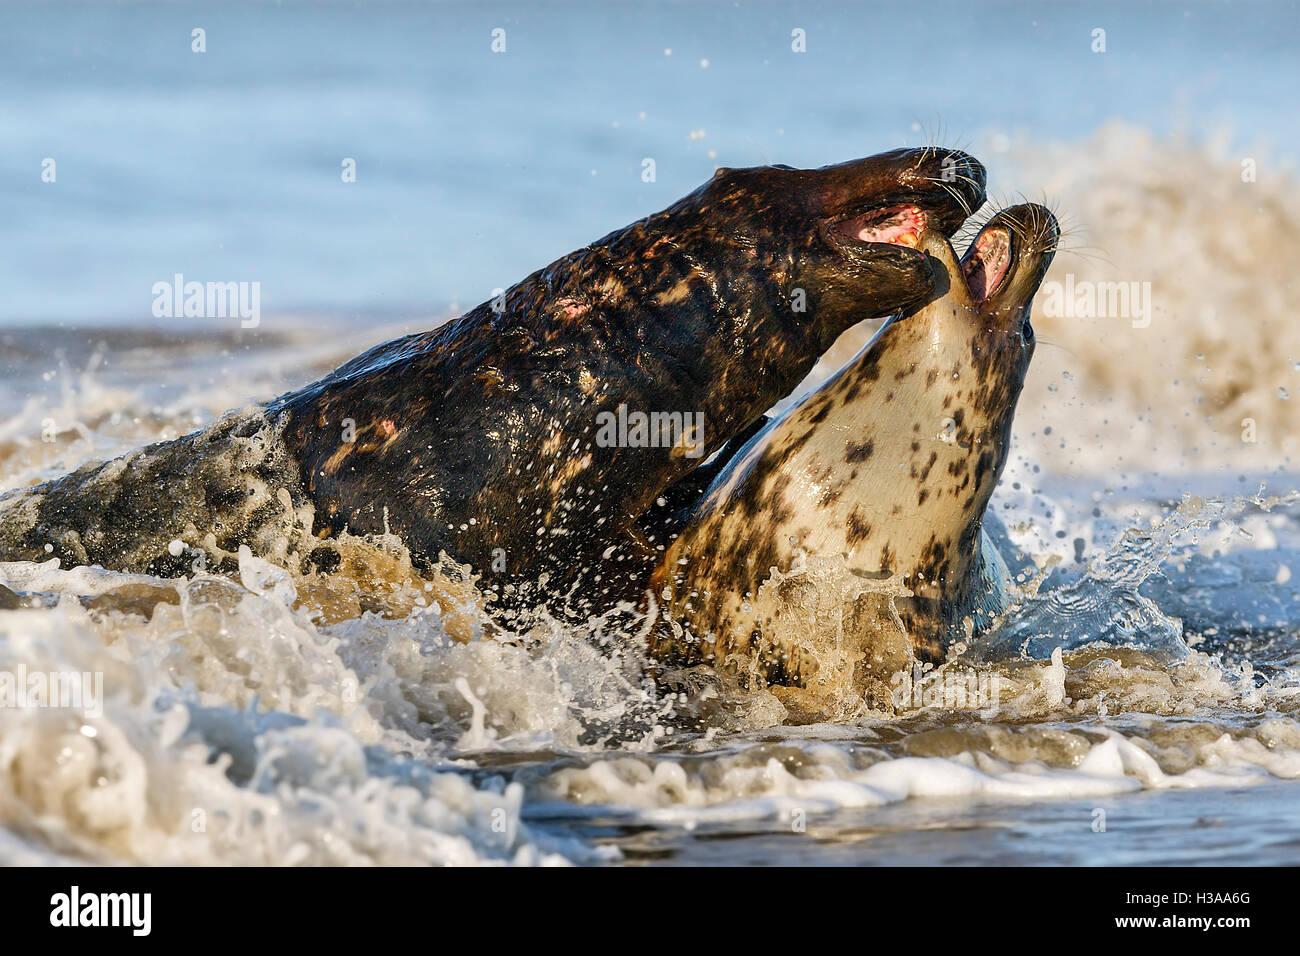 Kegelrobben Balz Verhalten, Nordseeküste, Norfolk, England Stockbild